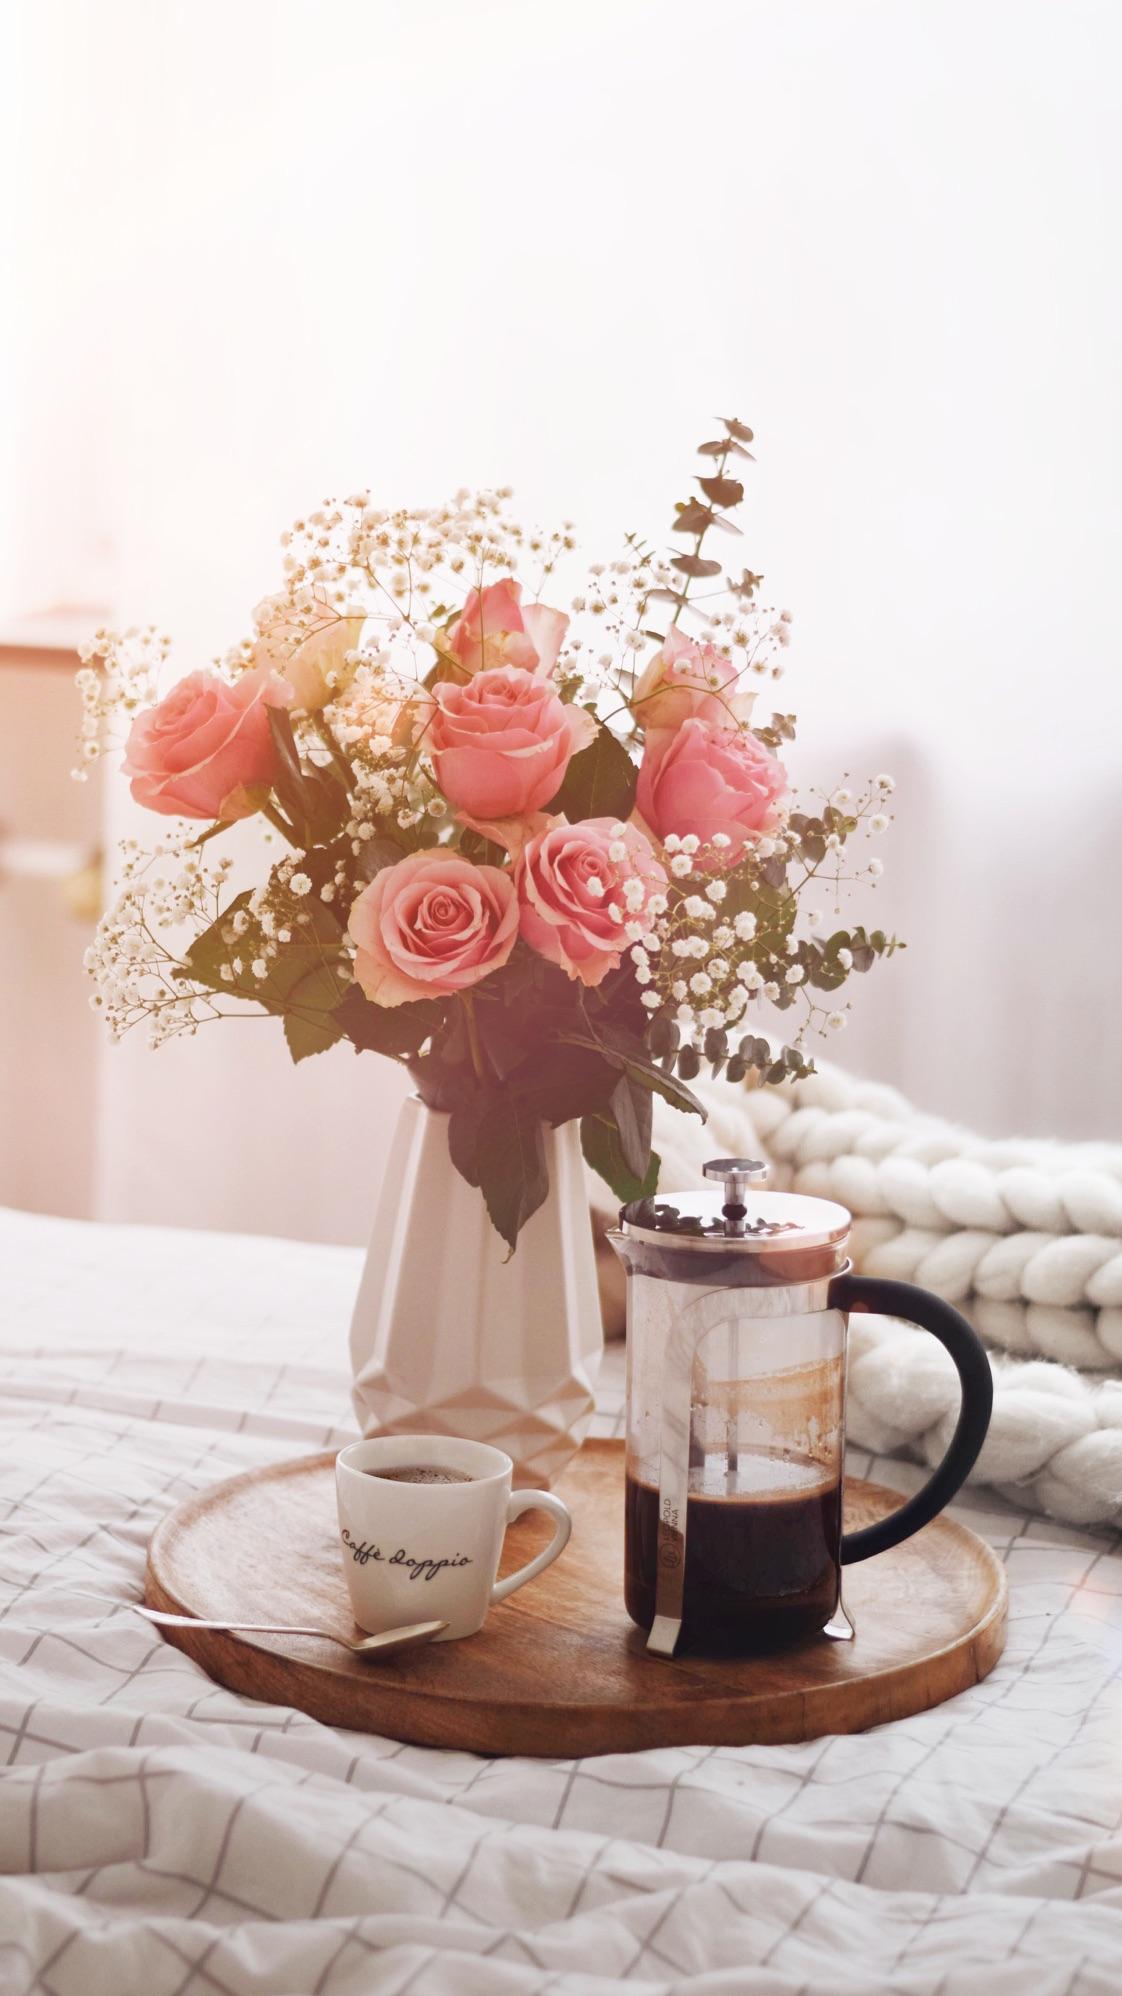 free mobil wallpaper sonne blumen kaffee